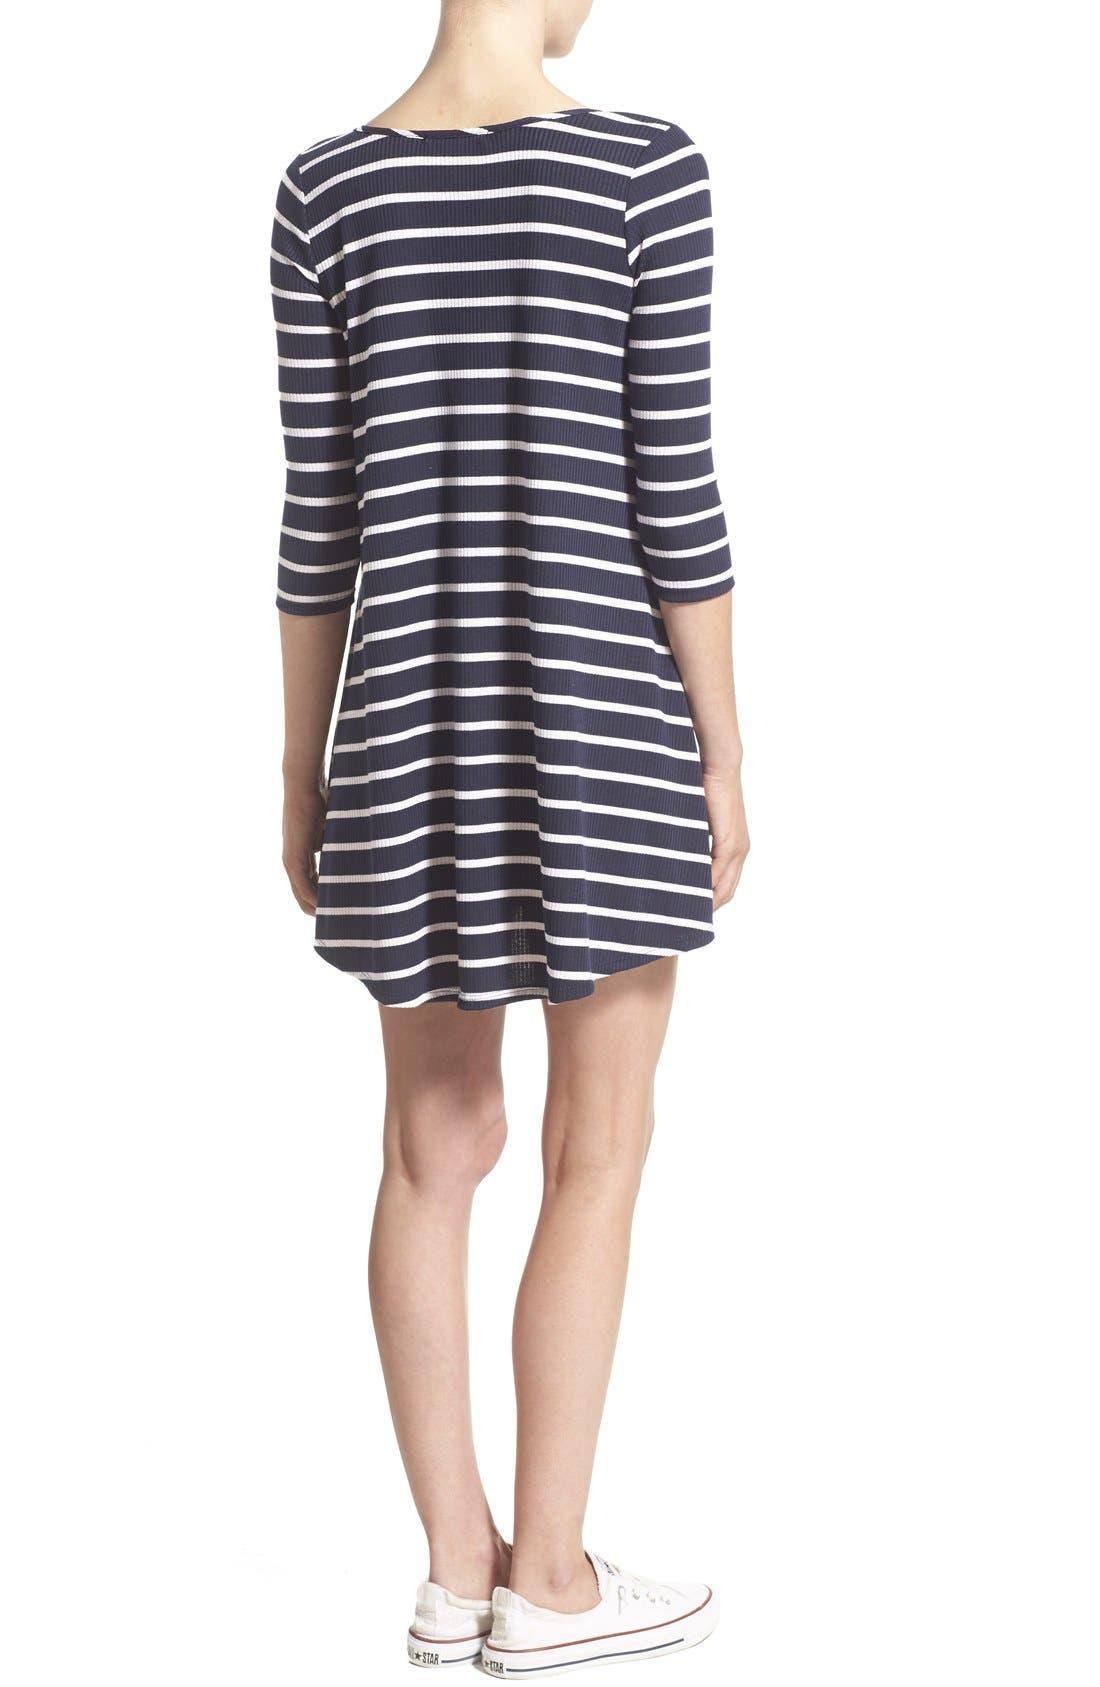 SOCIALITE, Stripe Lace-Up Minidress, Alternate thumbnail 4, color, 466